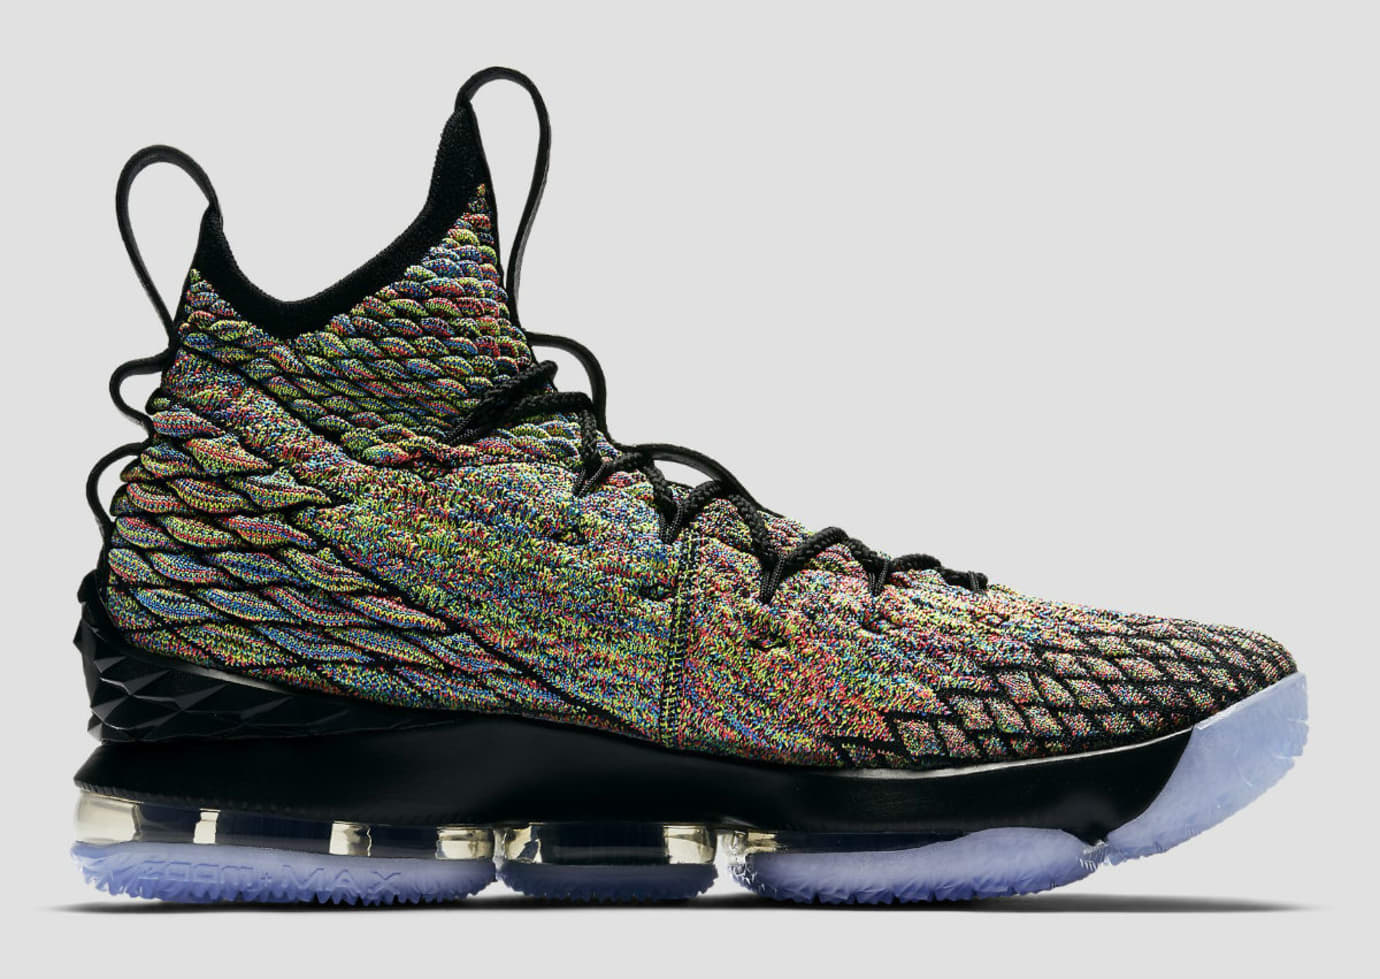 e3f11c40695610 Nike LeBron 15 XV Four Horsemen Black Fruity Pebbles Release Date 897648-901  Medial